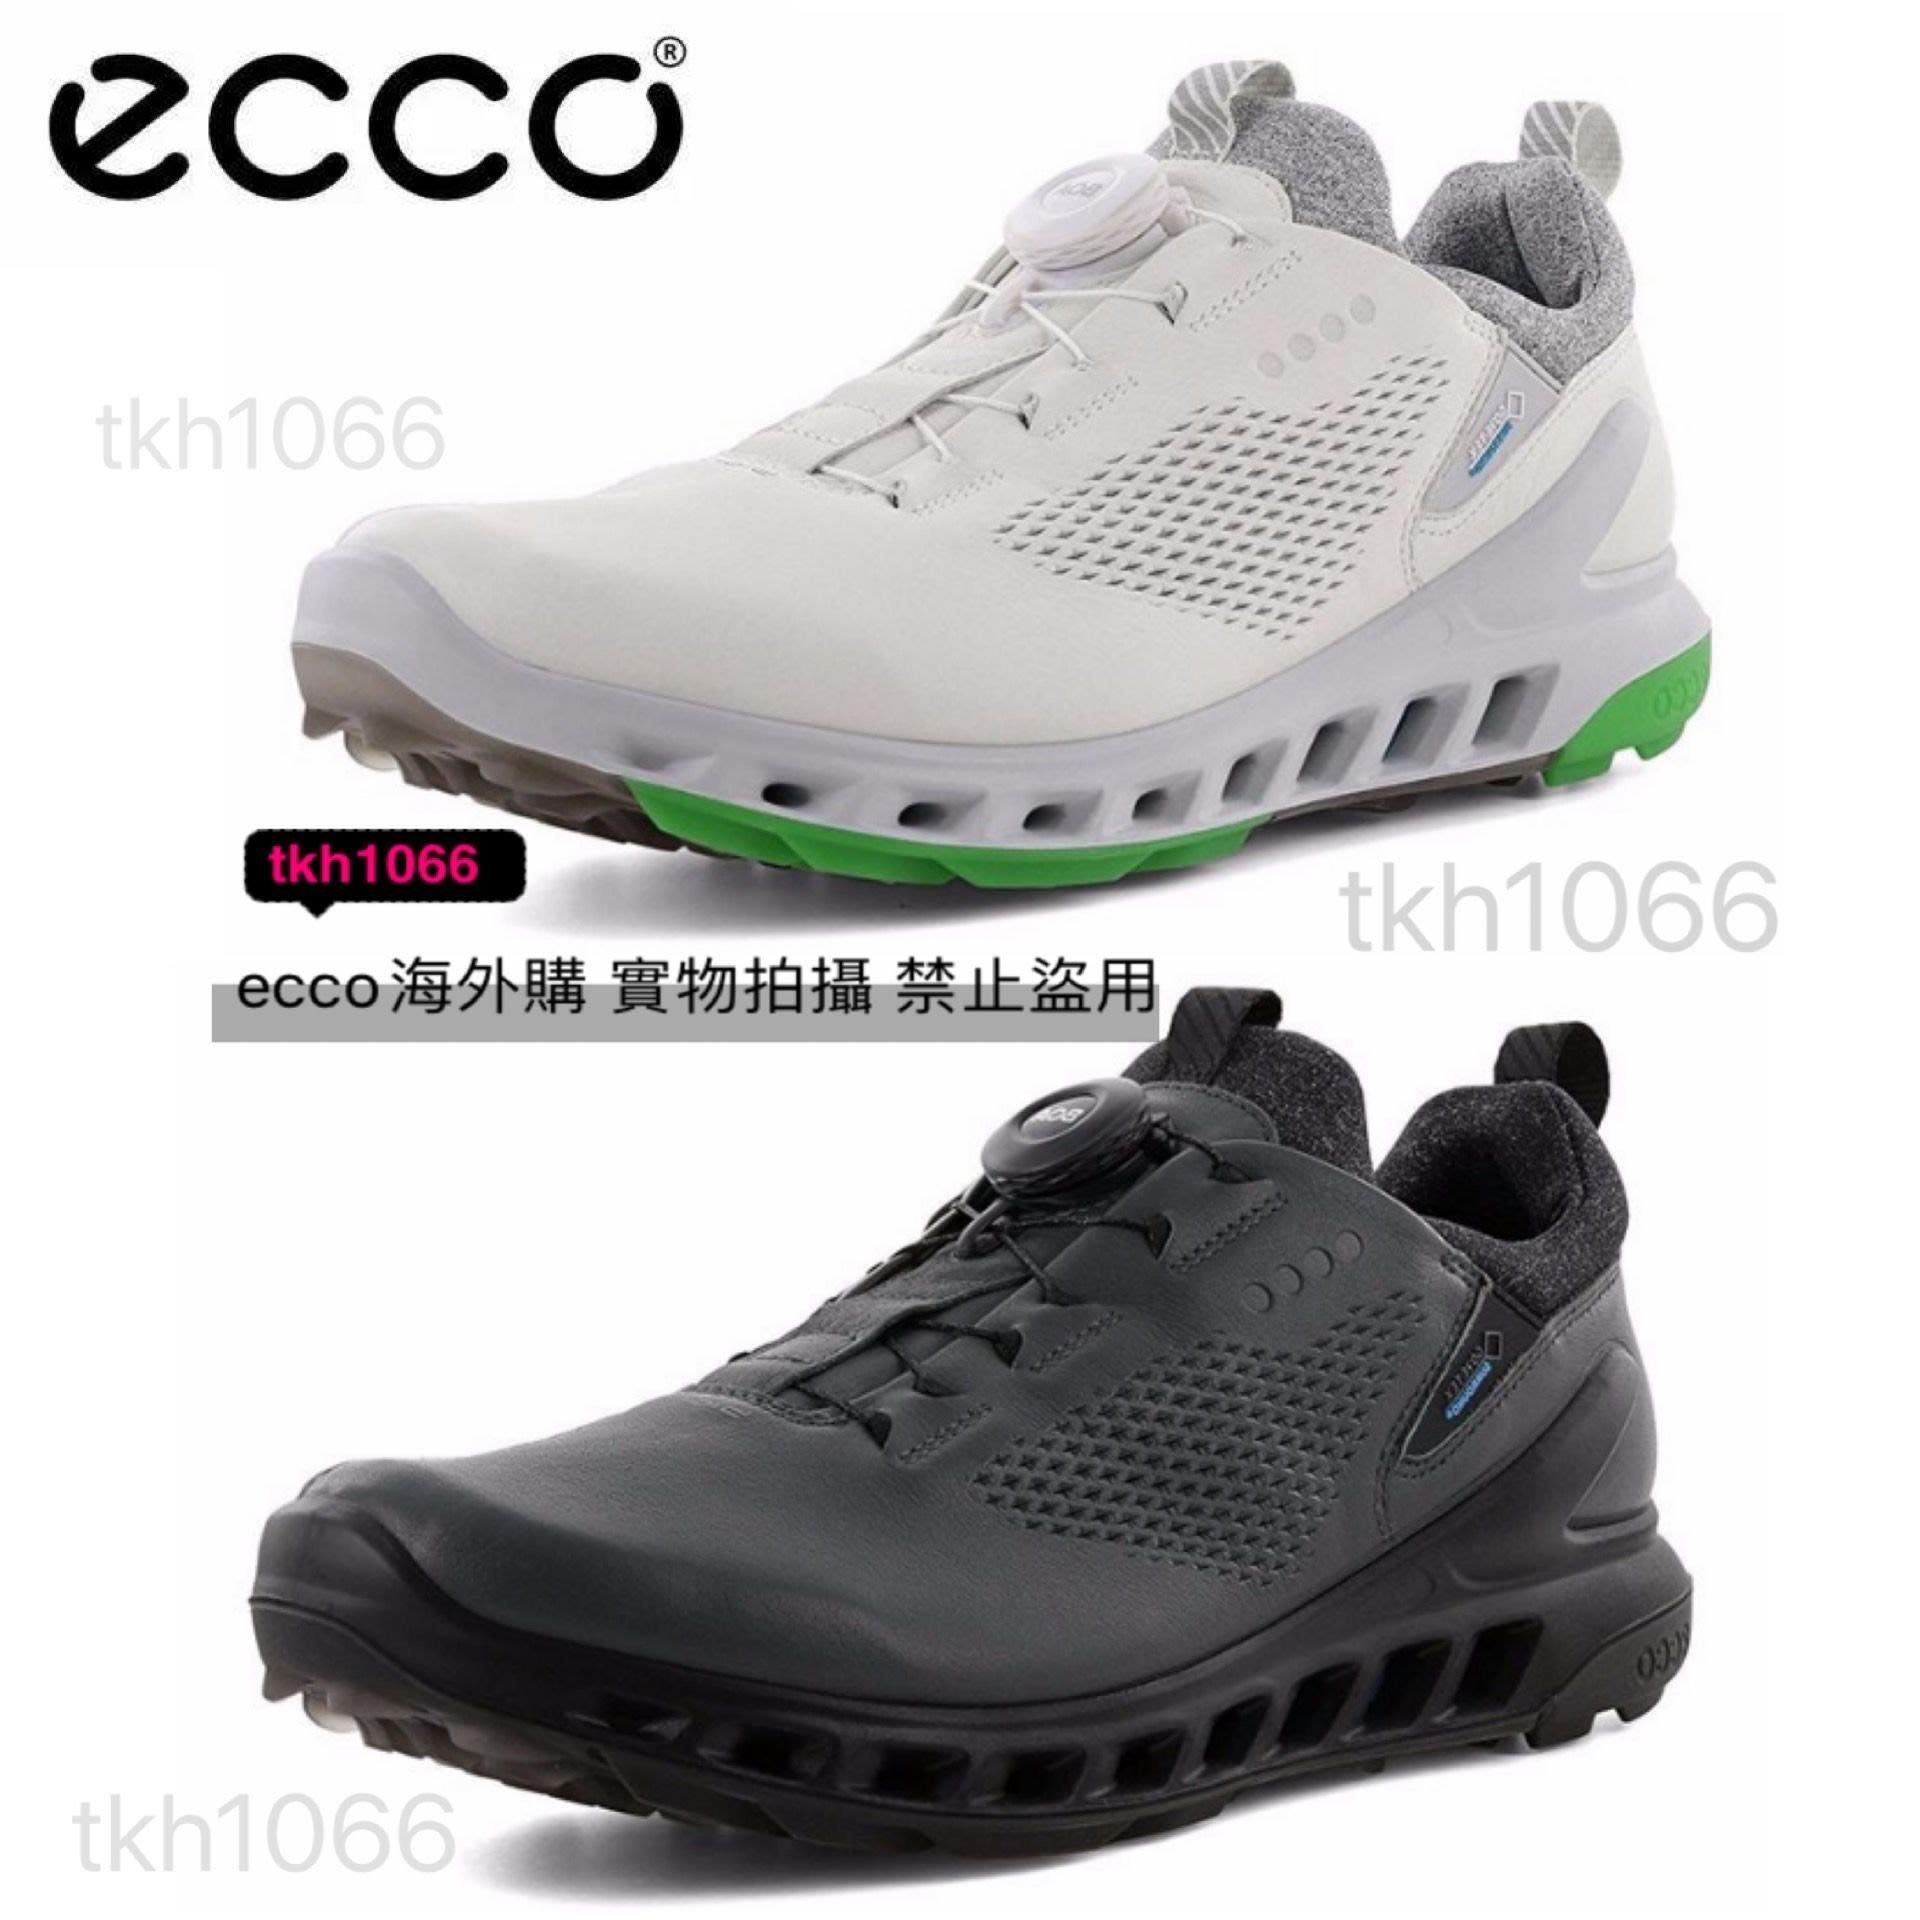 ECCO愛步高爾夫球鞋男士固定釘鞋golf時尚運動男子高爾夫健步透氧專業系列20款102114 39-44碼